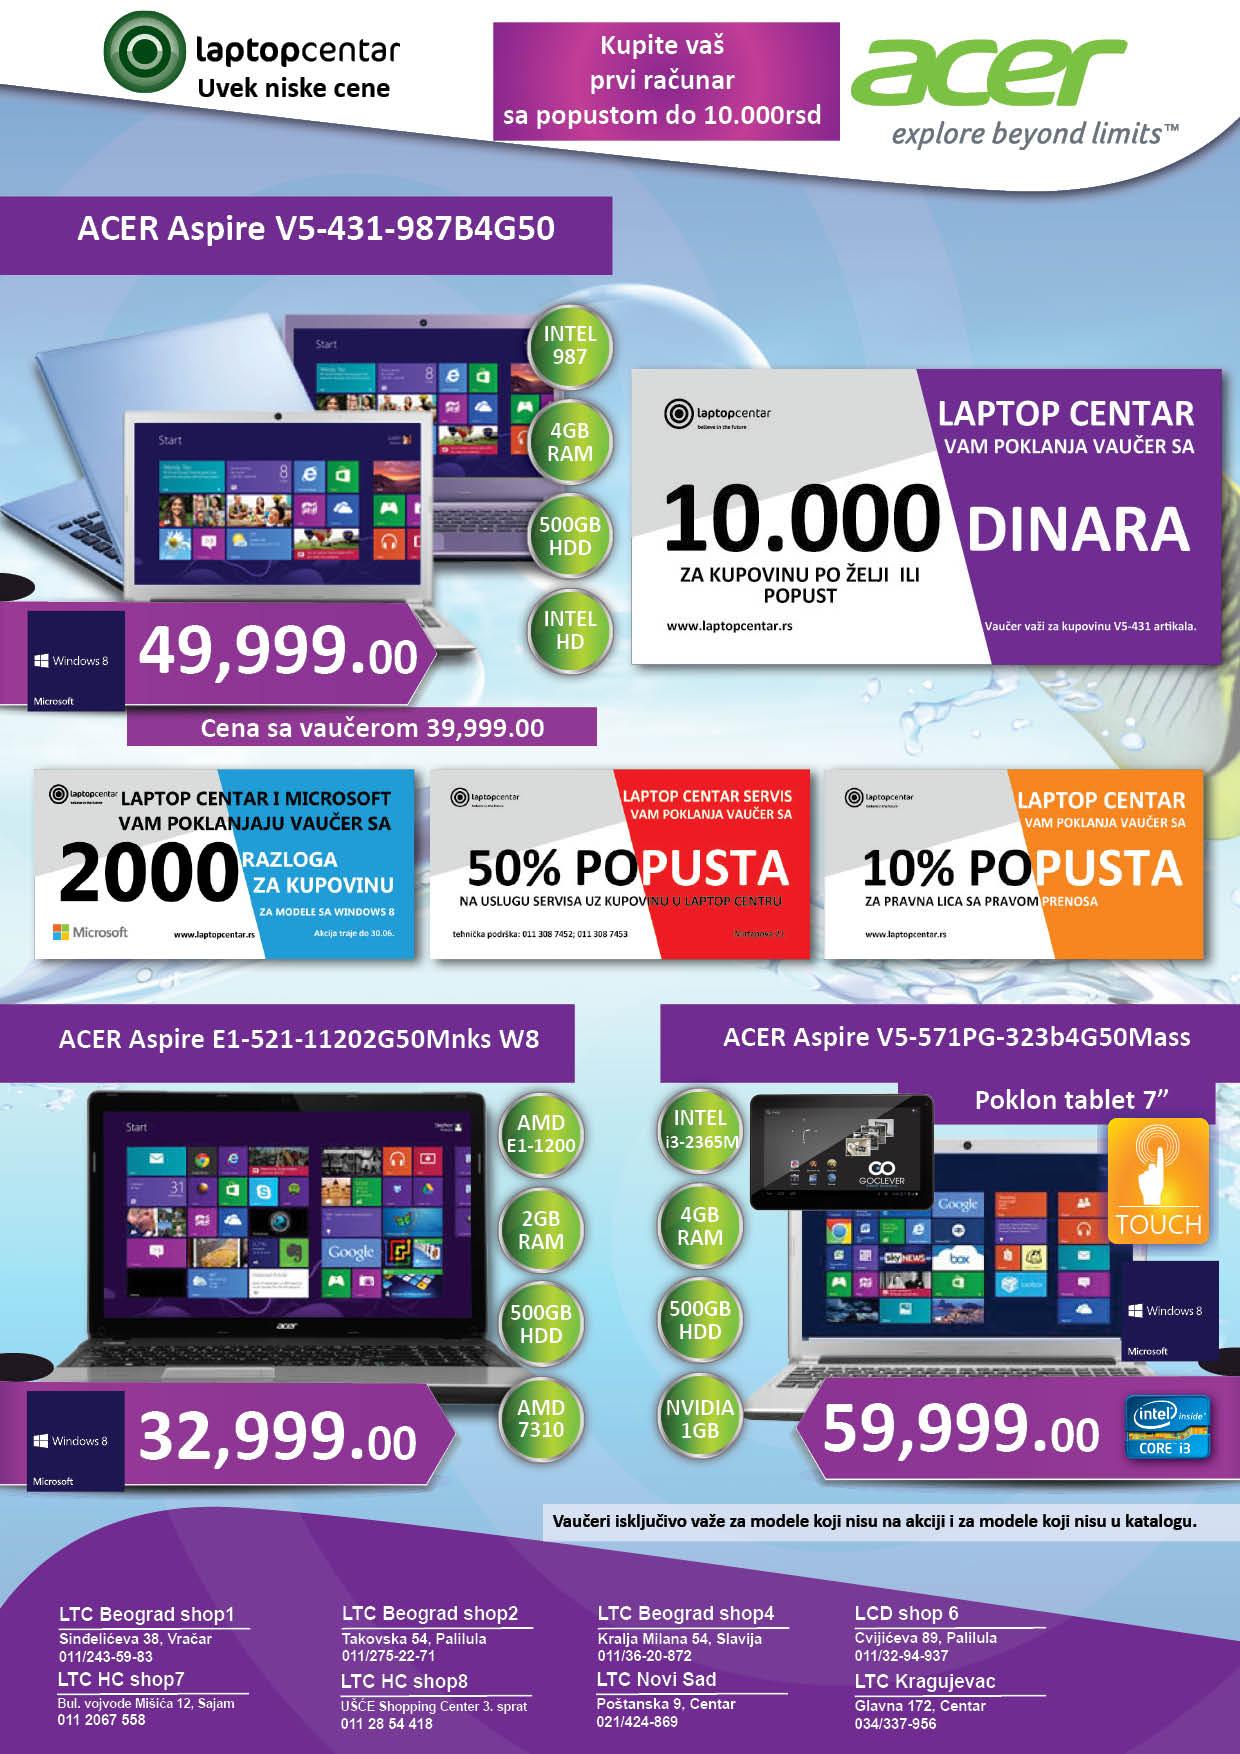 Laptop centra Katalog mesec odlične kupovine